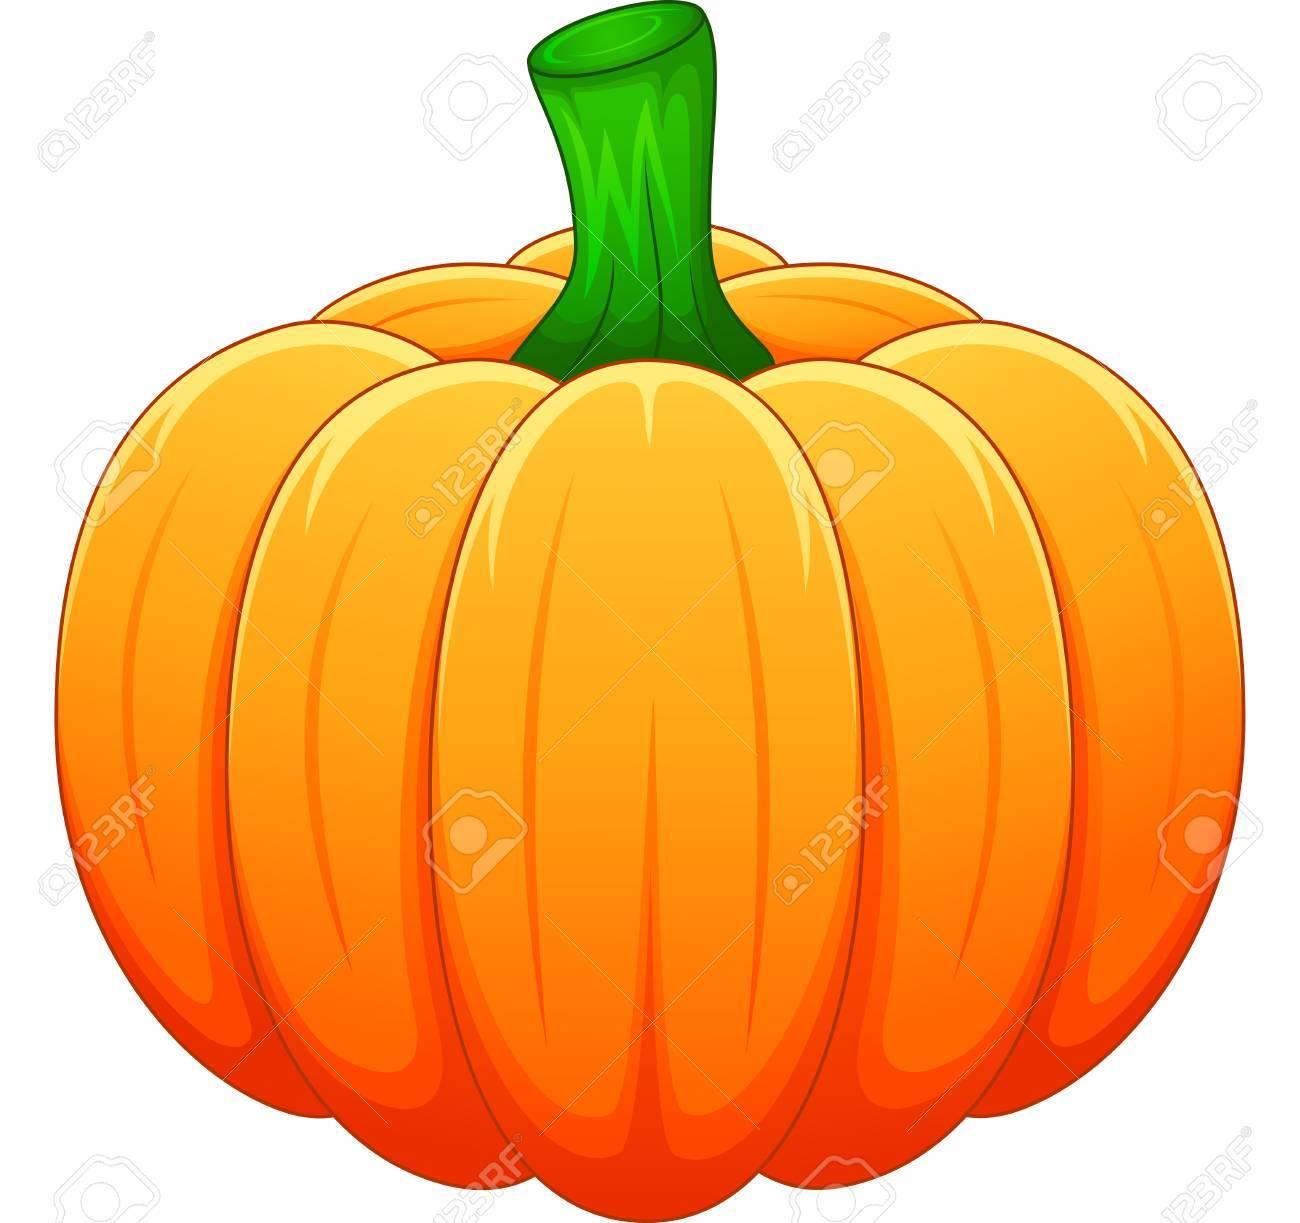 Cartoon pumpkin royalty free cliparts vectors and stock cartoon pumpkin thecheapjerseys Gallery